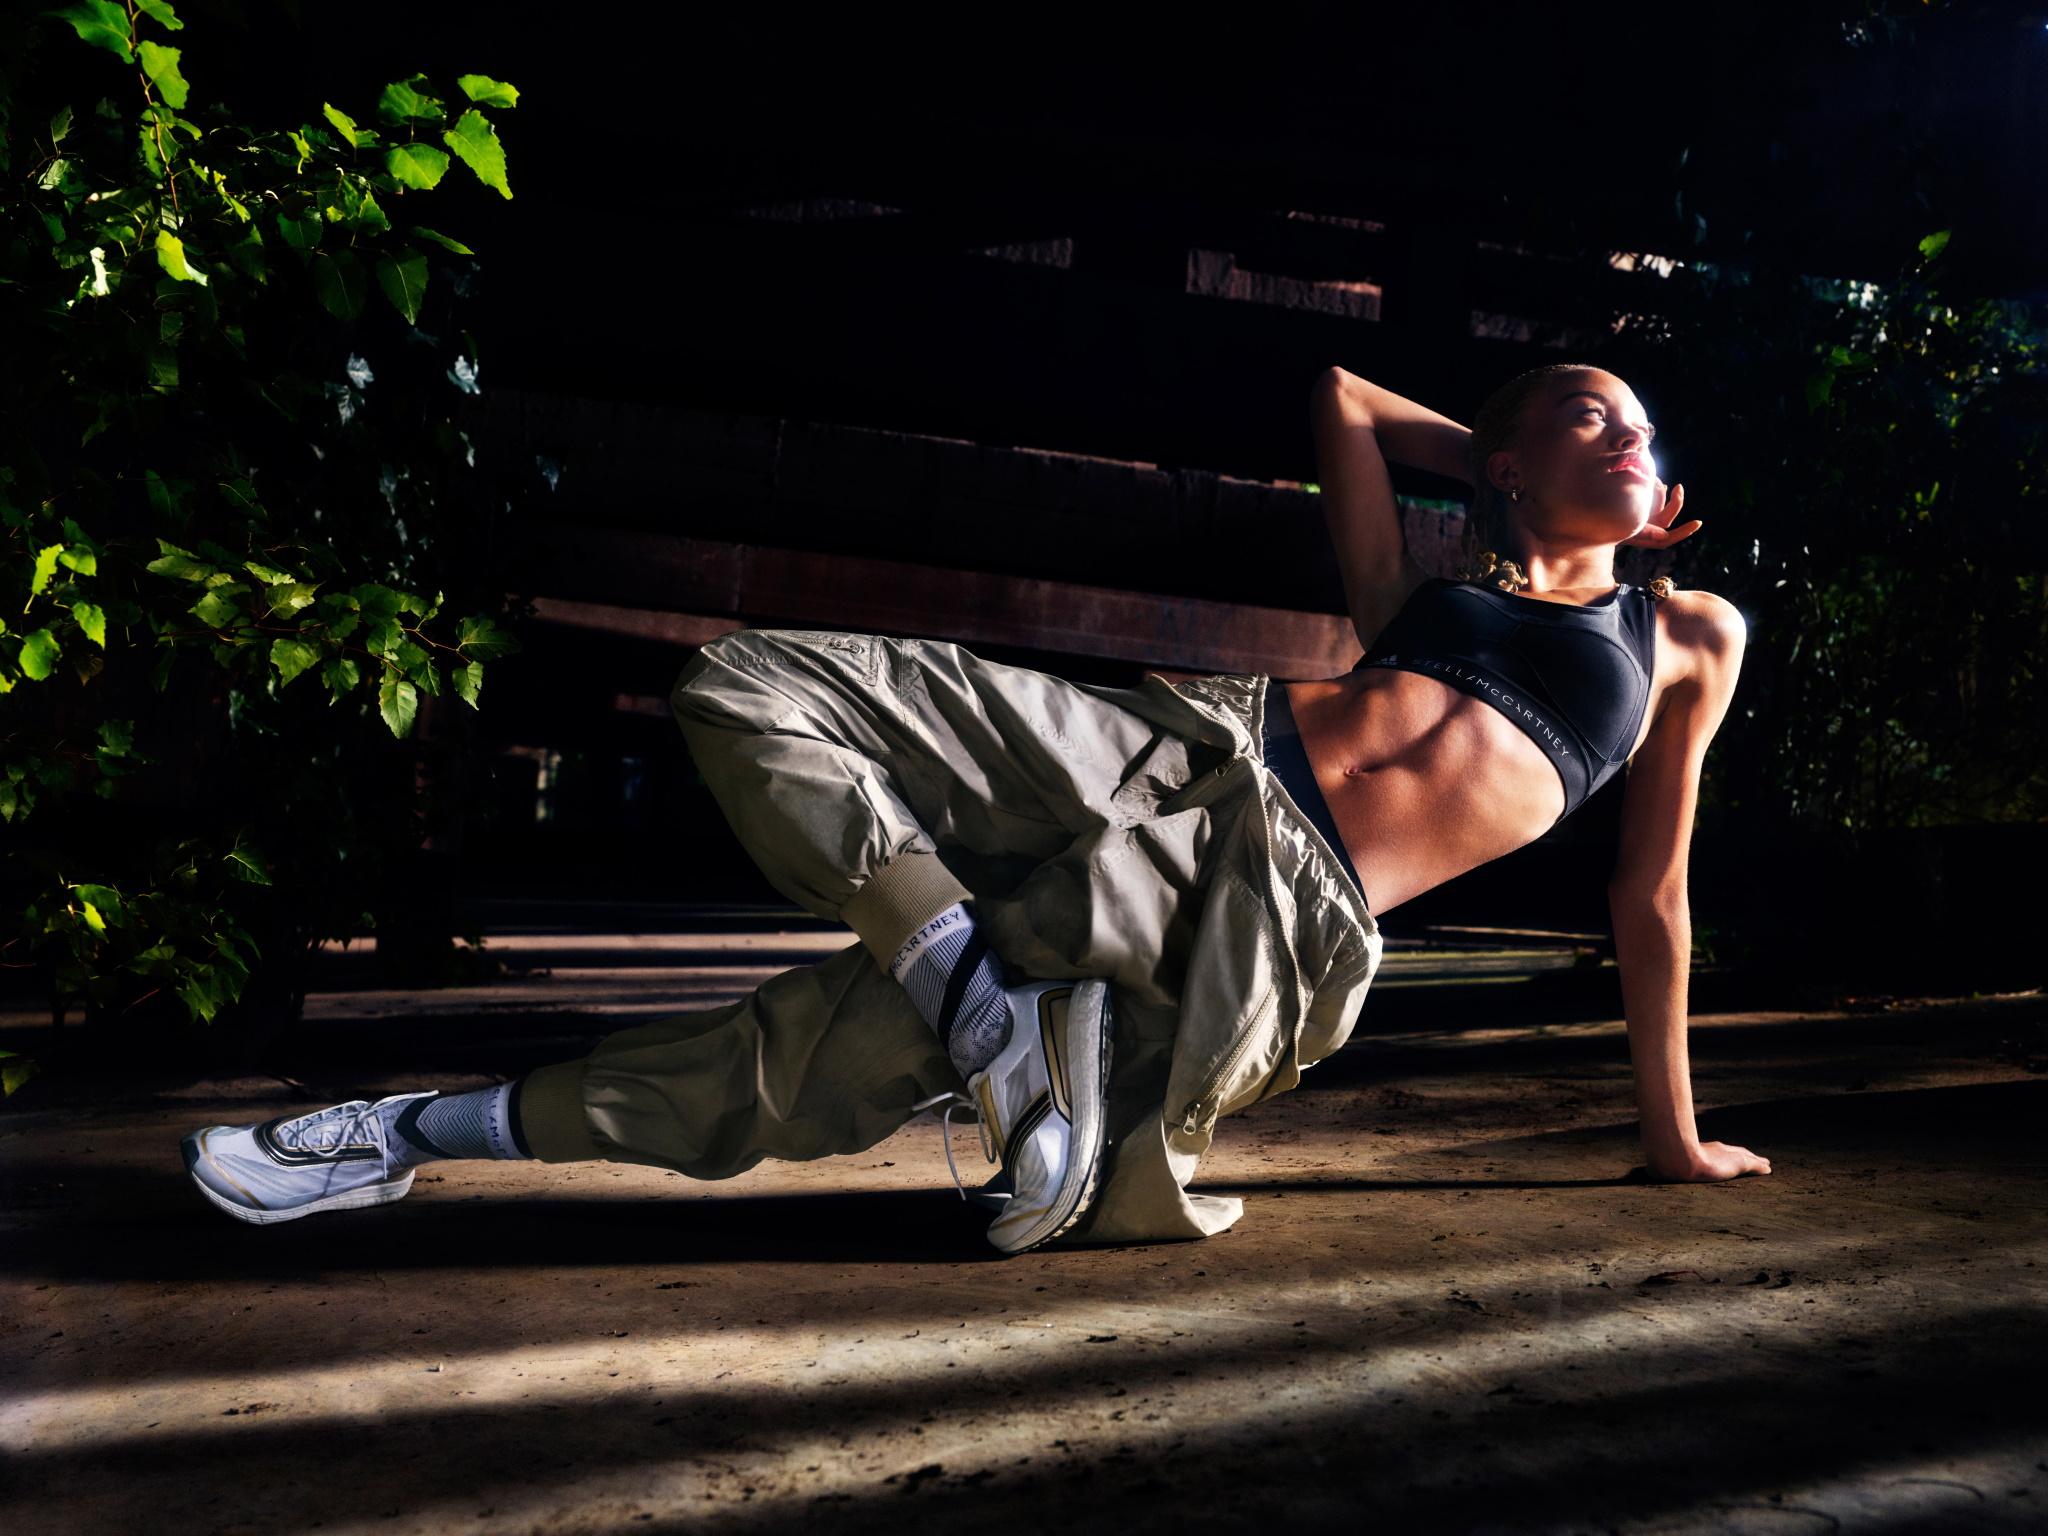 Athleisure: da passarela para as pistas | Unibanco